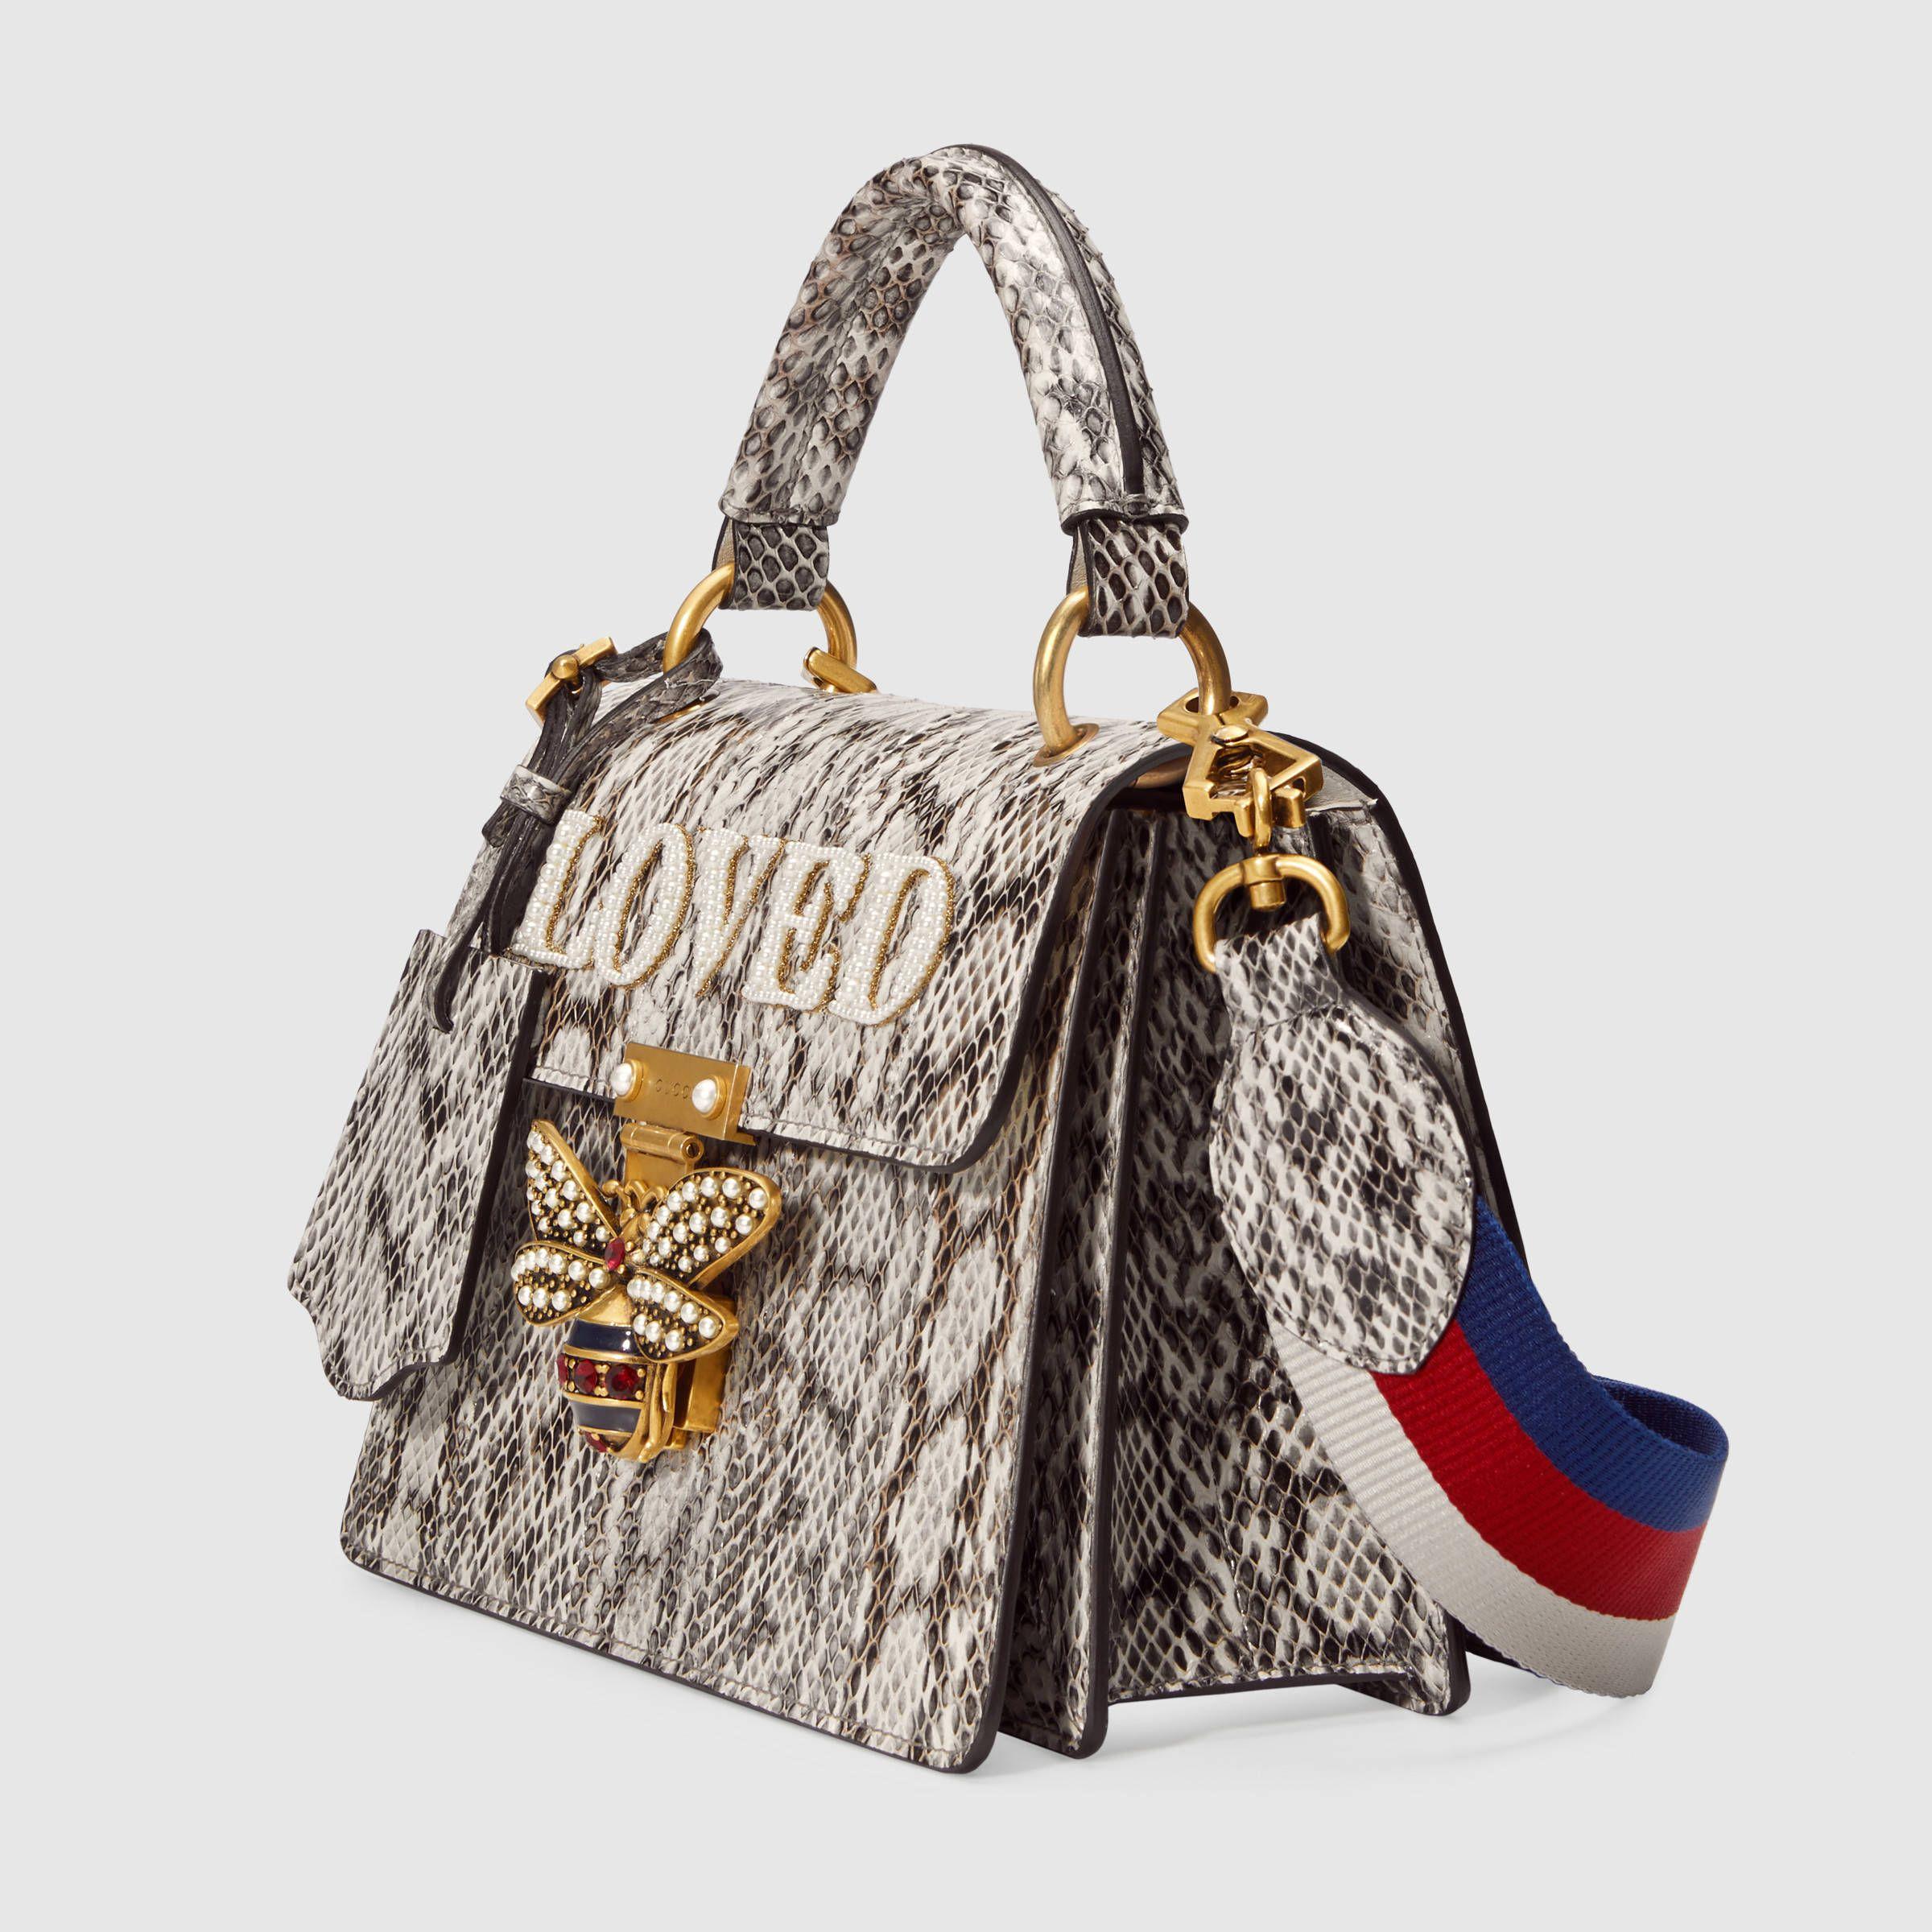 Gucci Sac à main Queen Margaret en peau de serpent Detail 2   MES ... 83ad99981a7